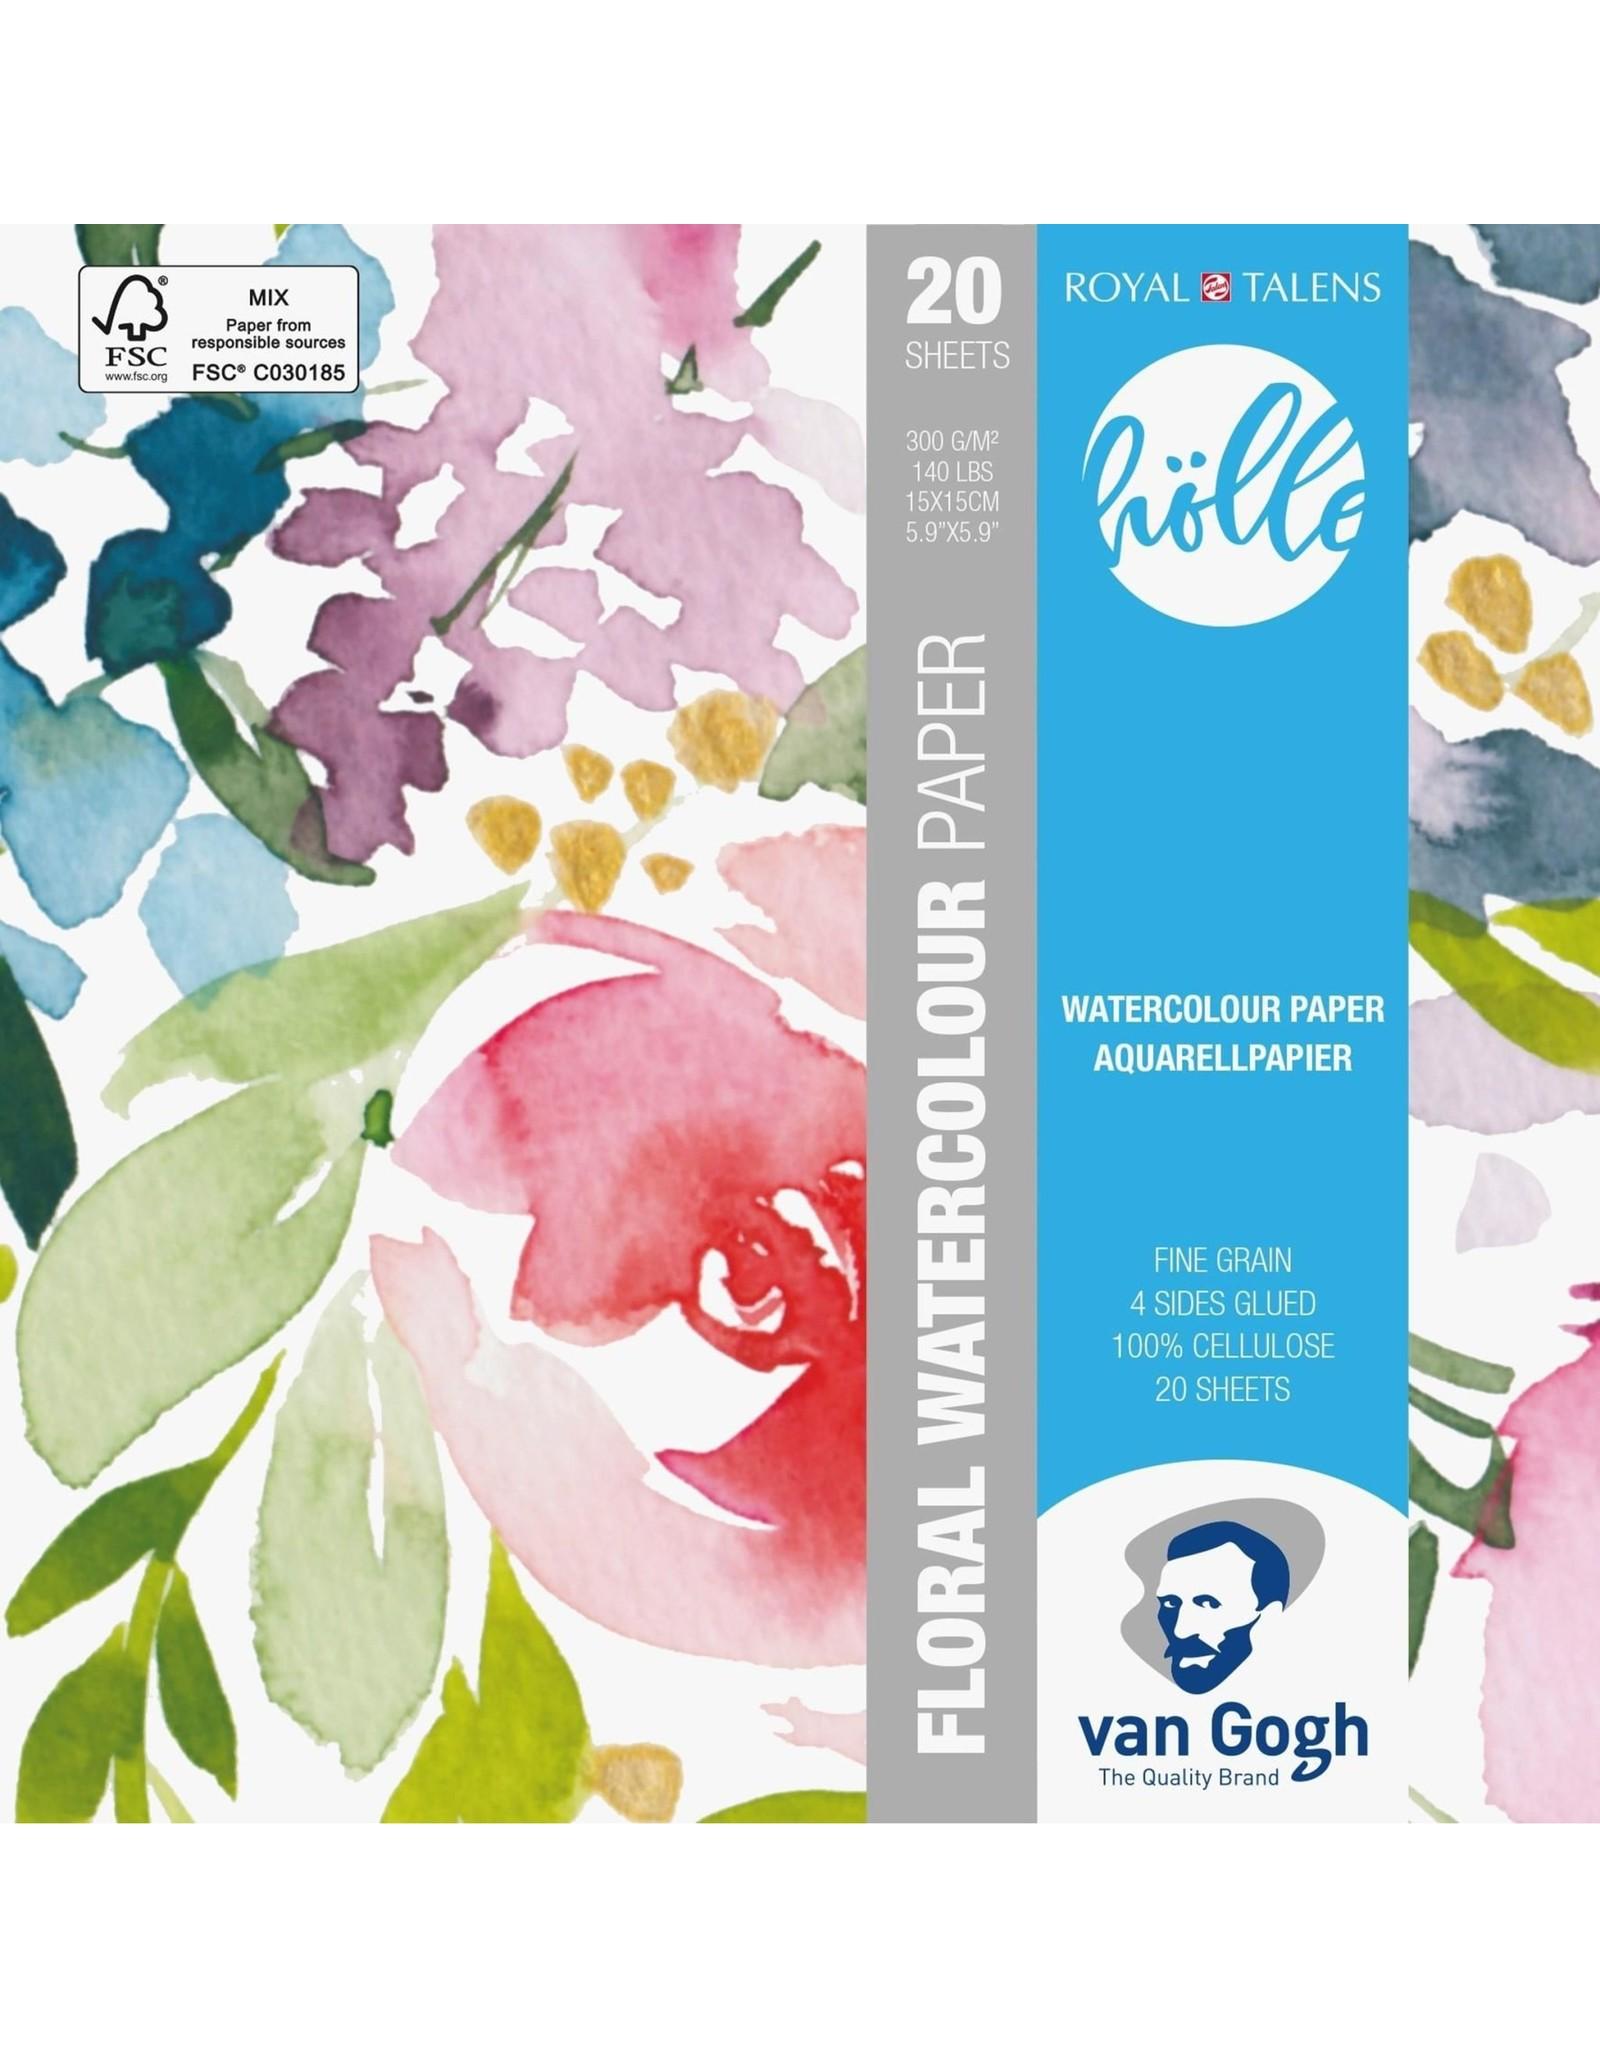 Van Gogh Aquarelpapier frau holle 15x15 300gr